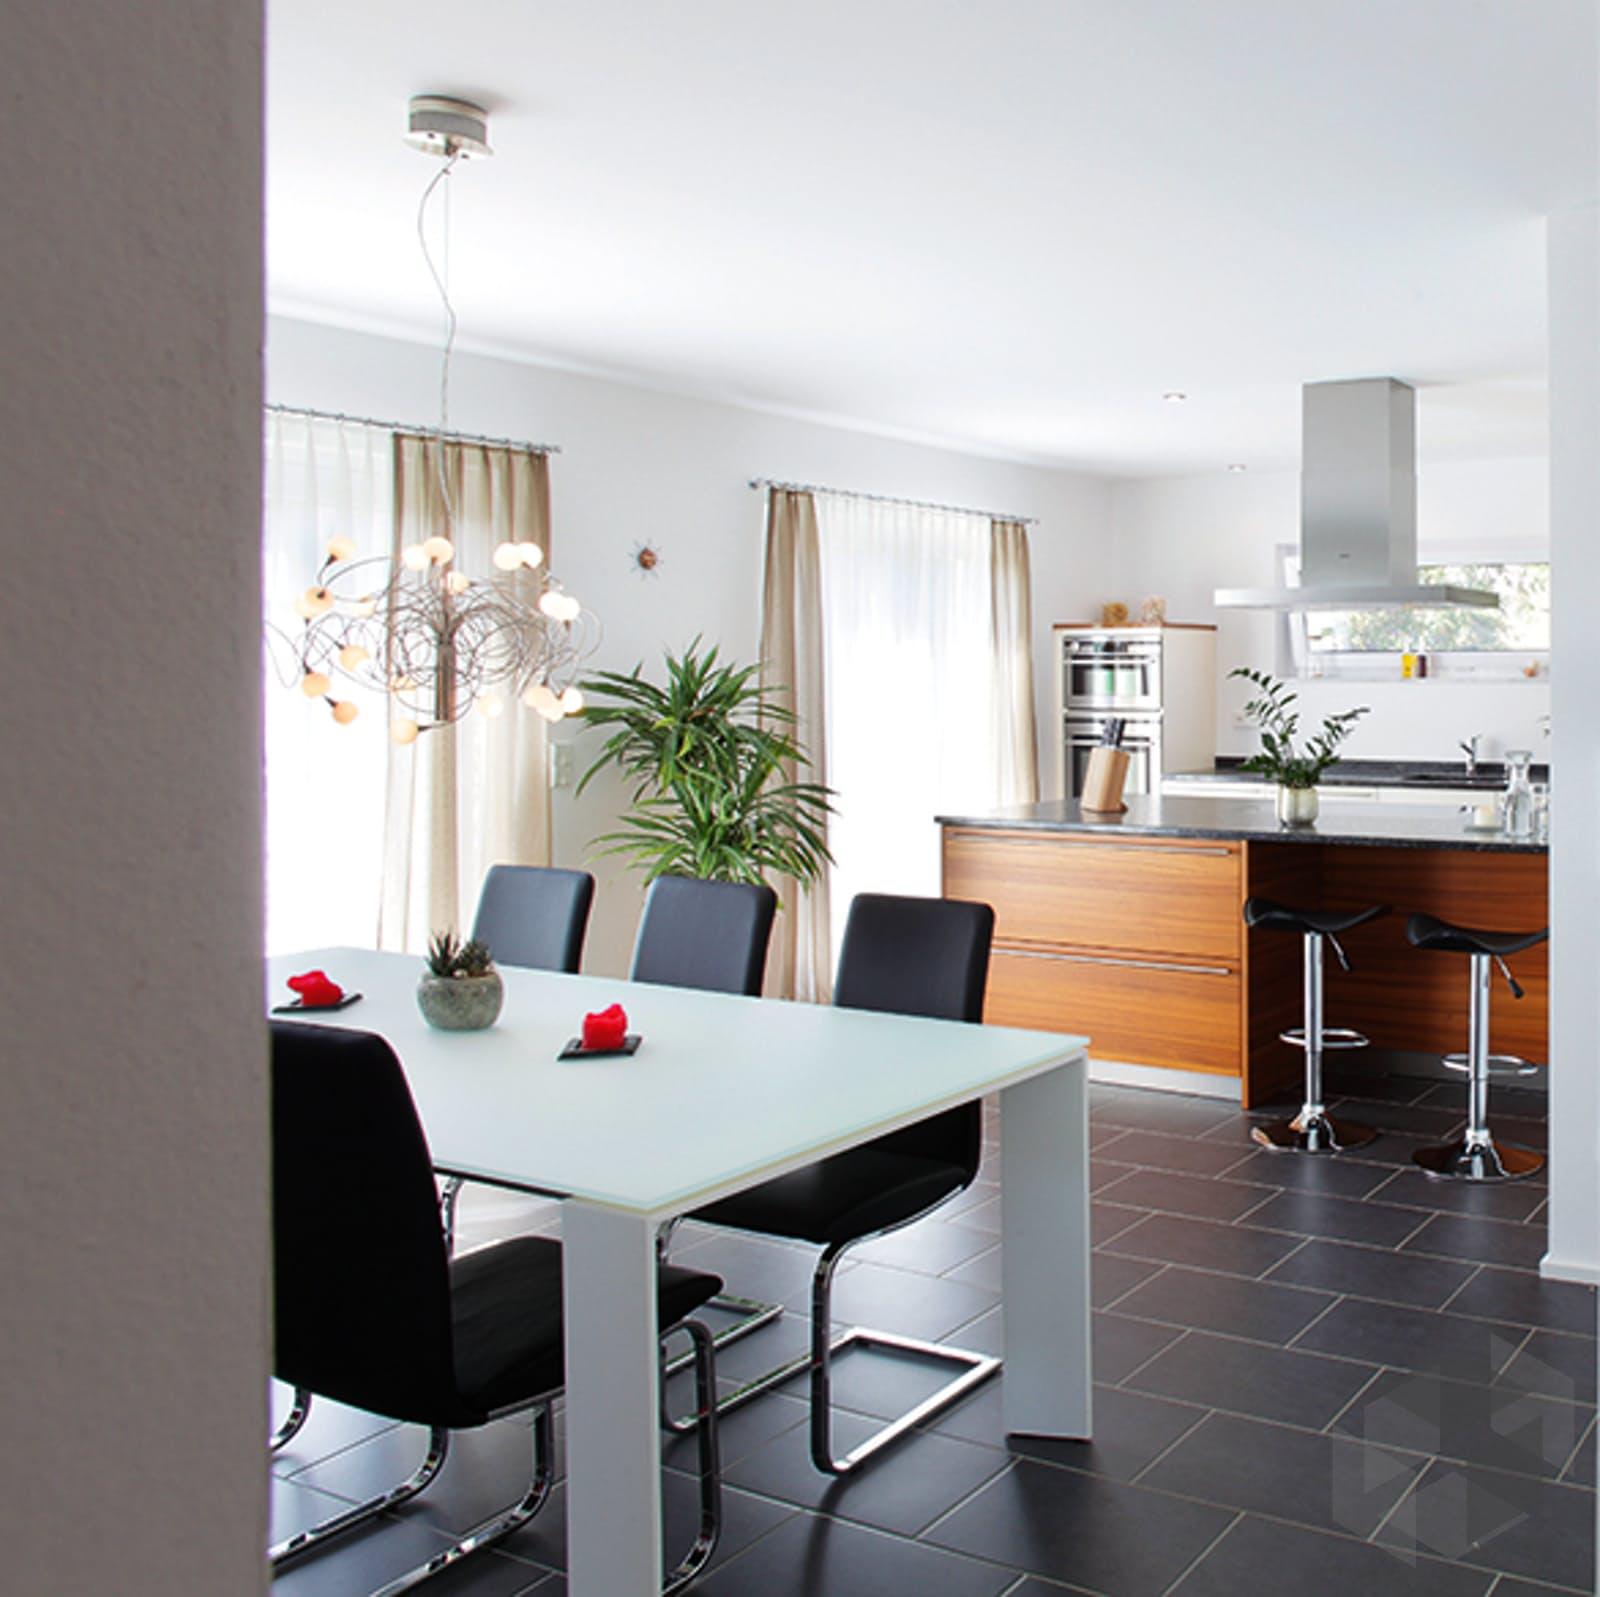 cubus 148 von hanse haus. Black Bedroom Furniture Sets. Home Design Ideas